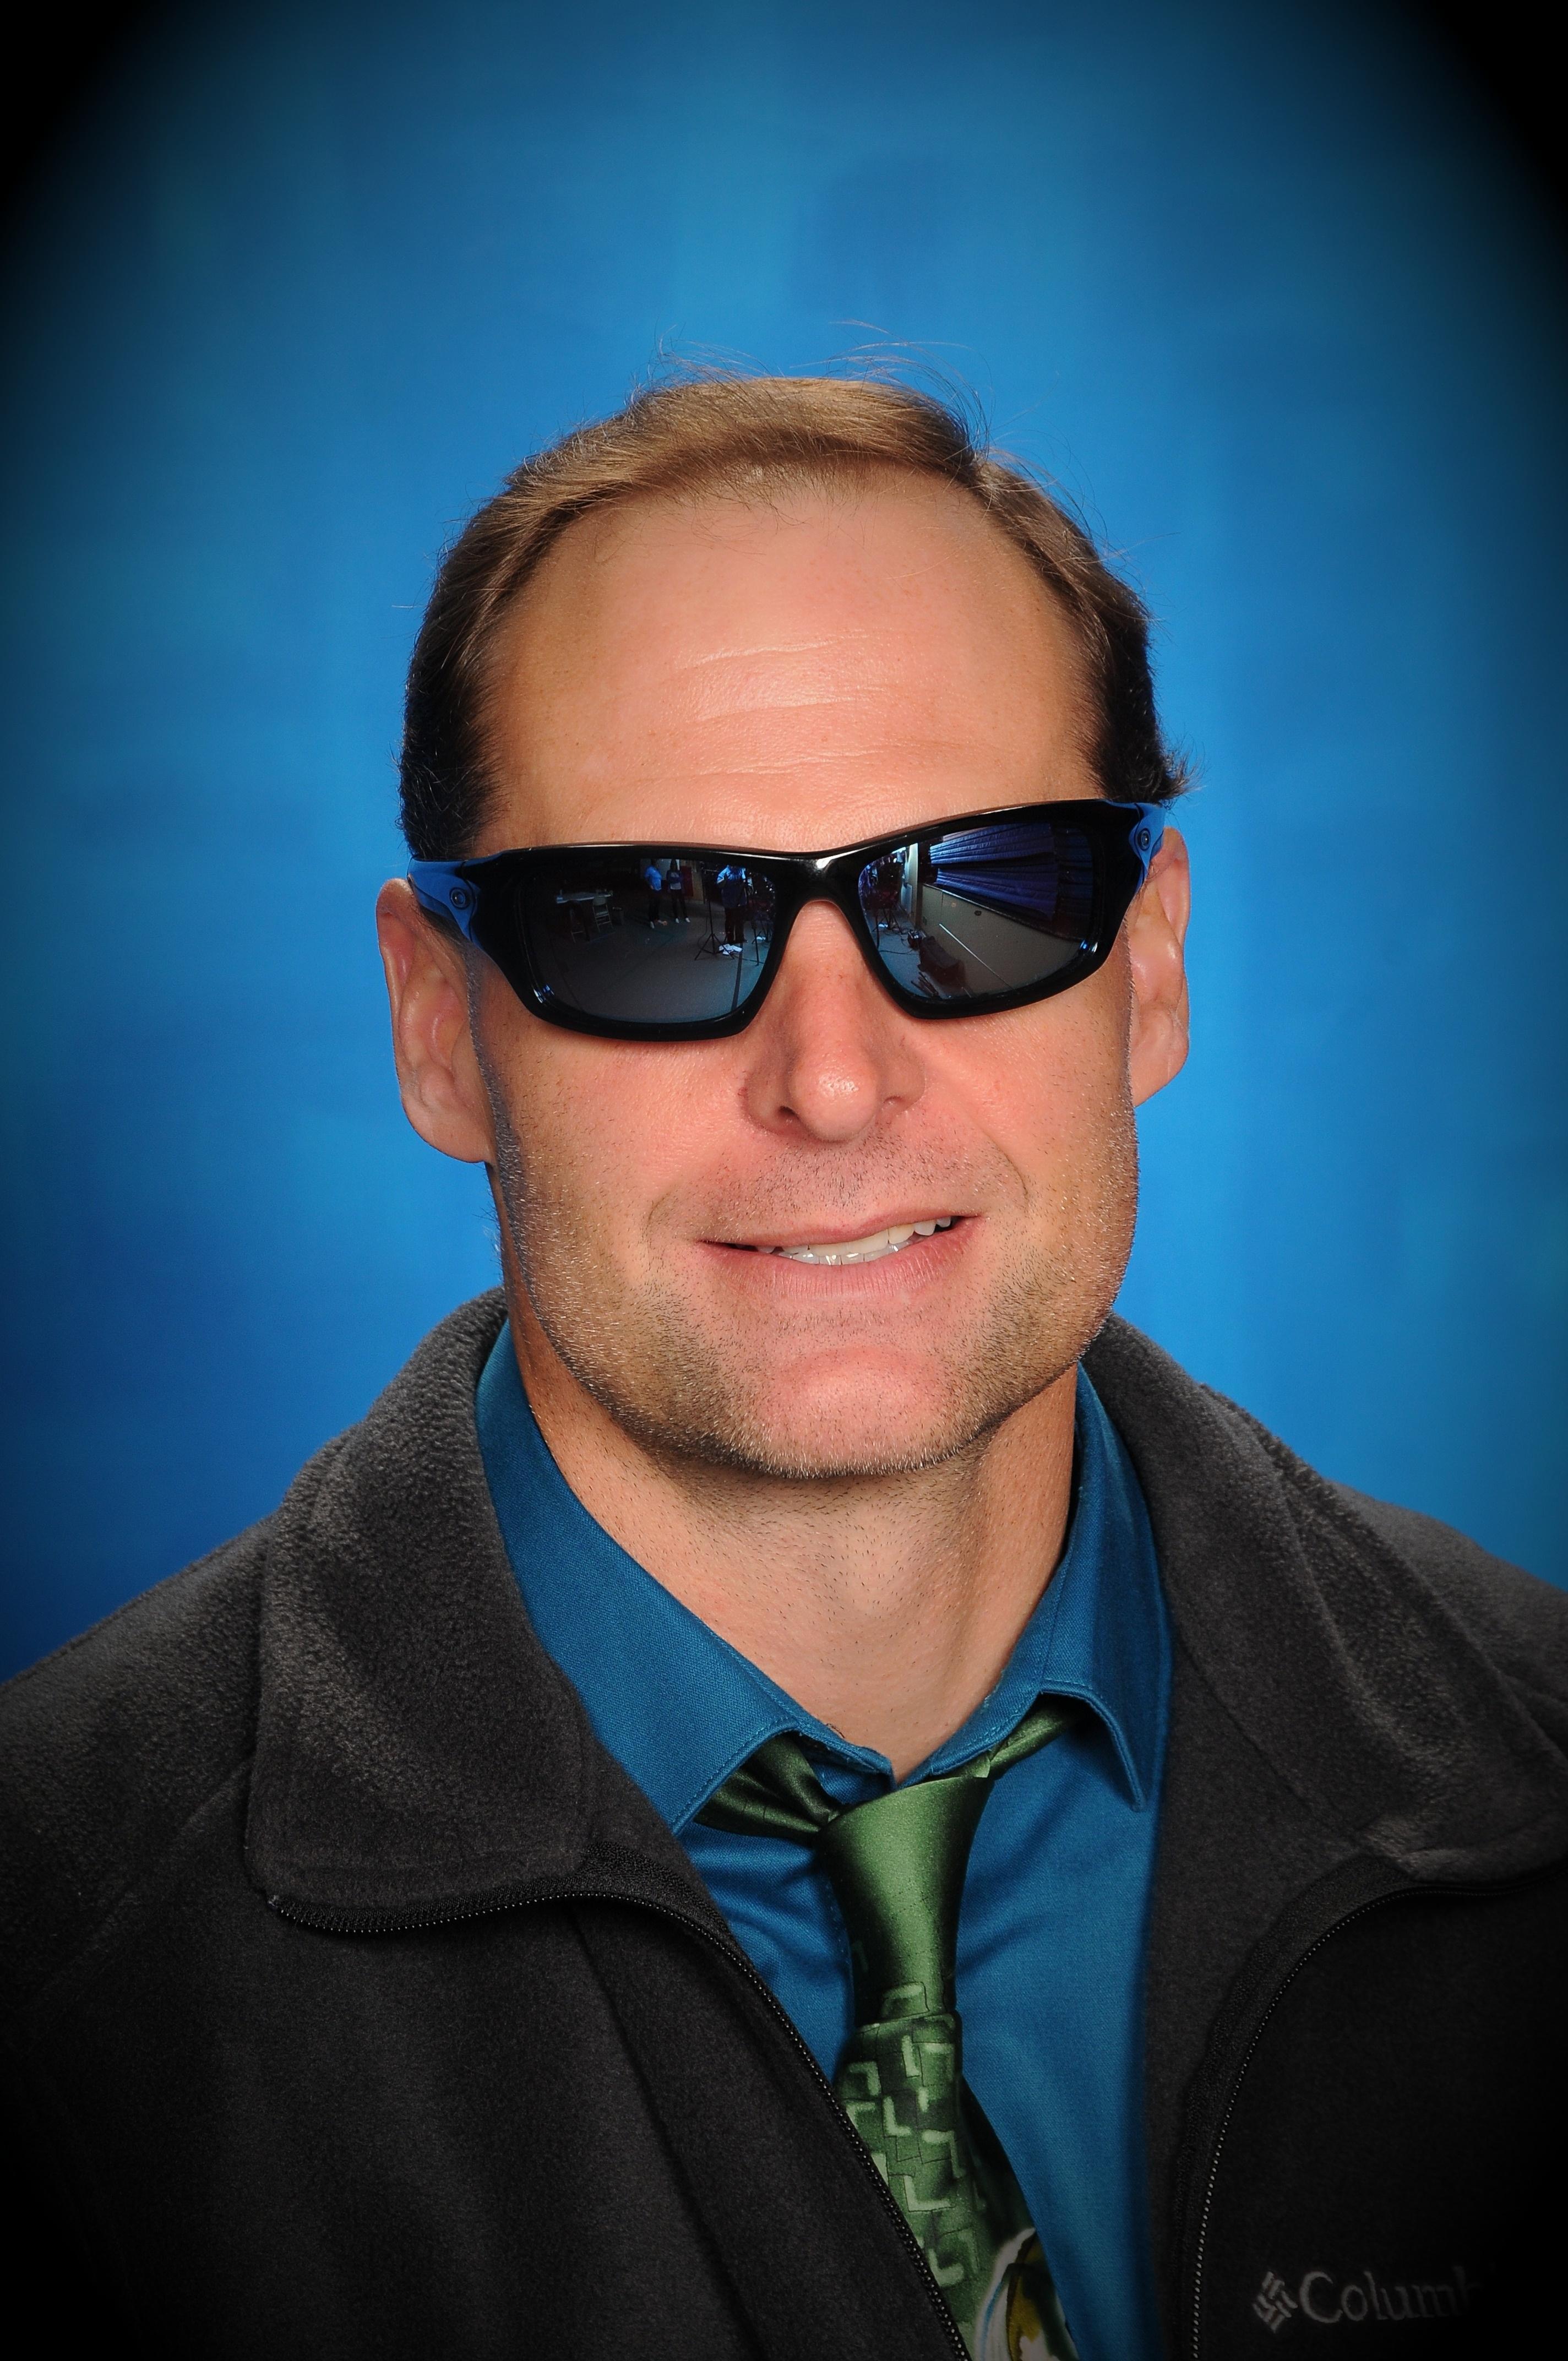 Principal John Farley